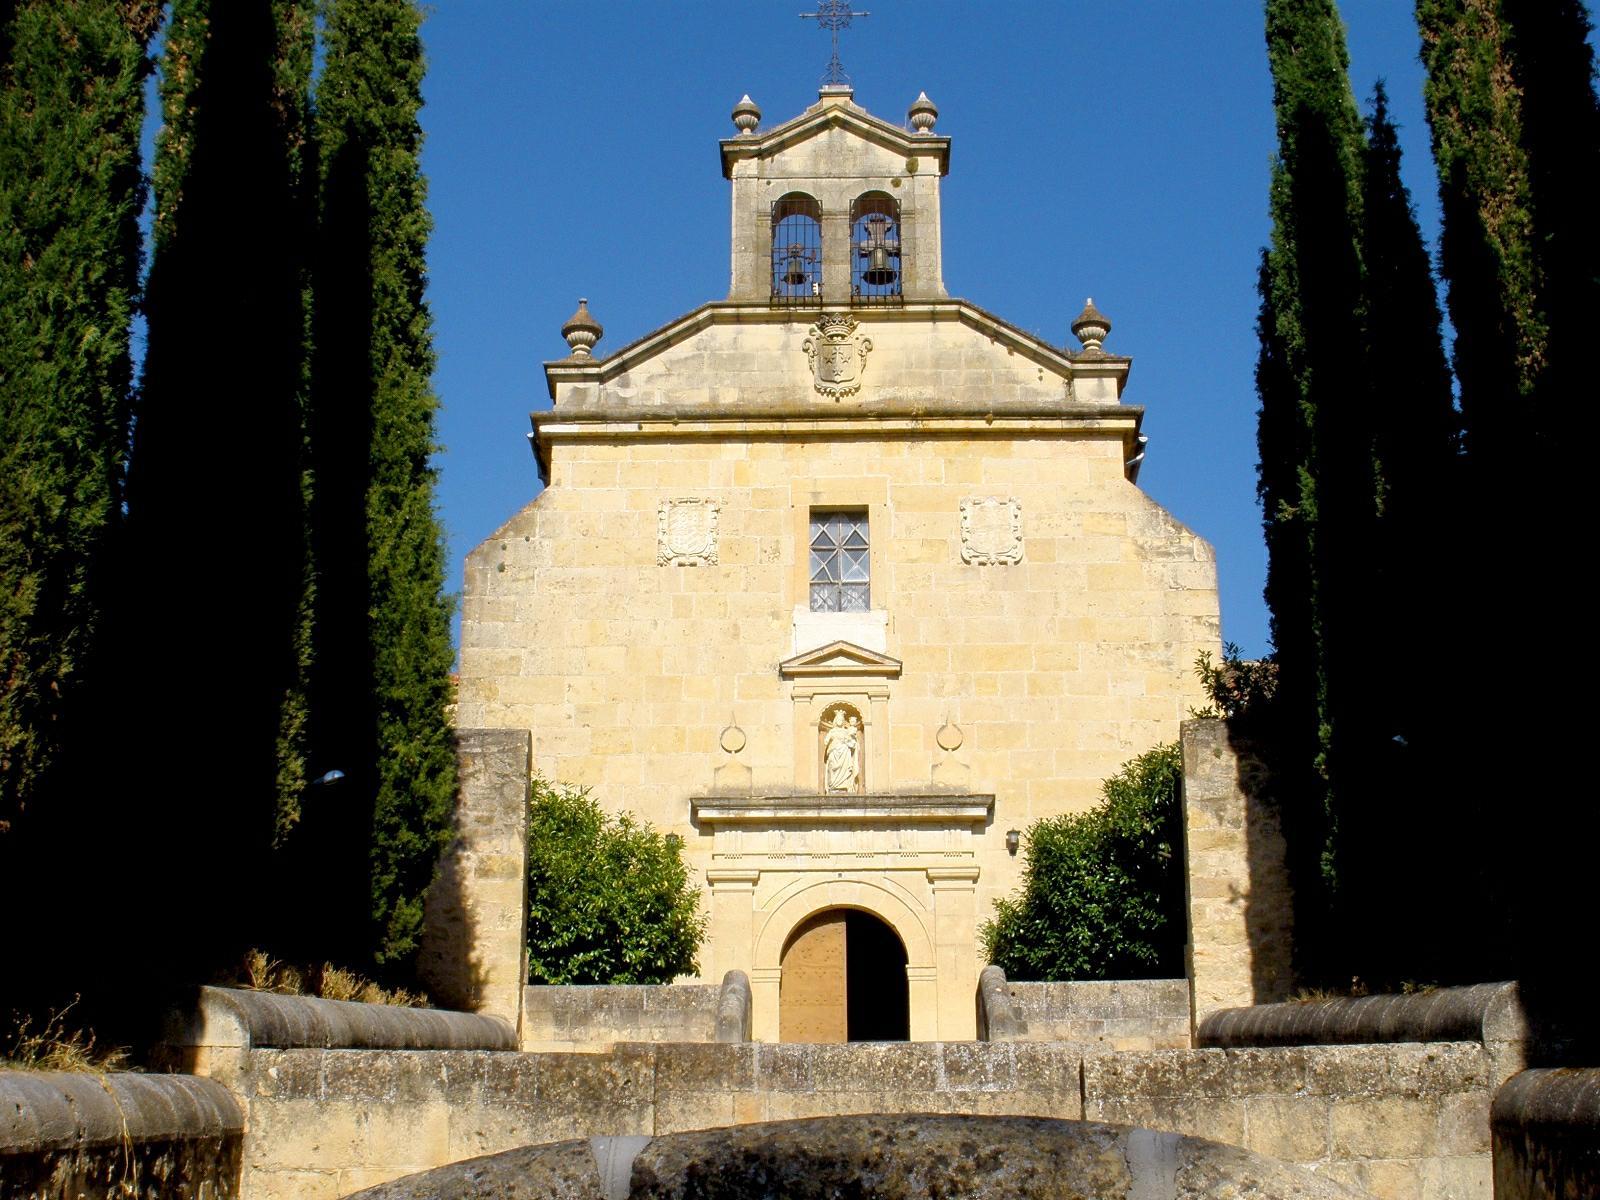 File:Segovia - Convento de los Carmelitas Descalzos 04.jpg ...